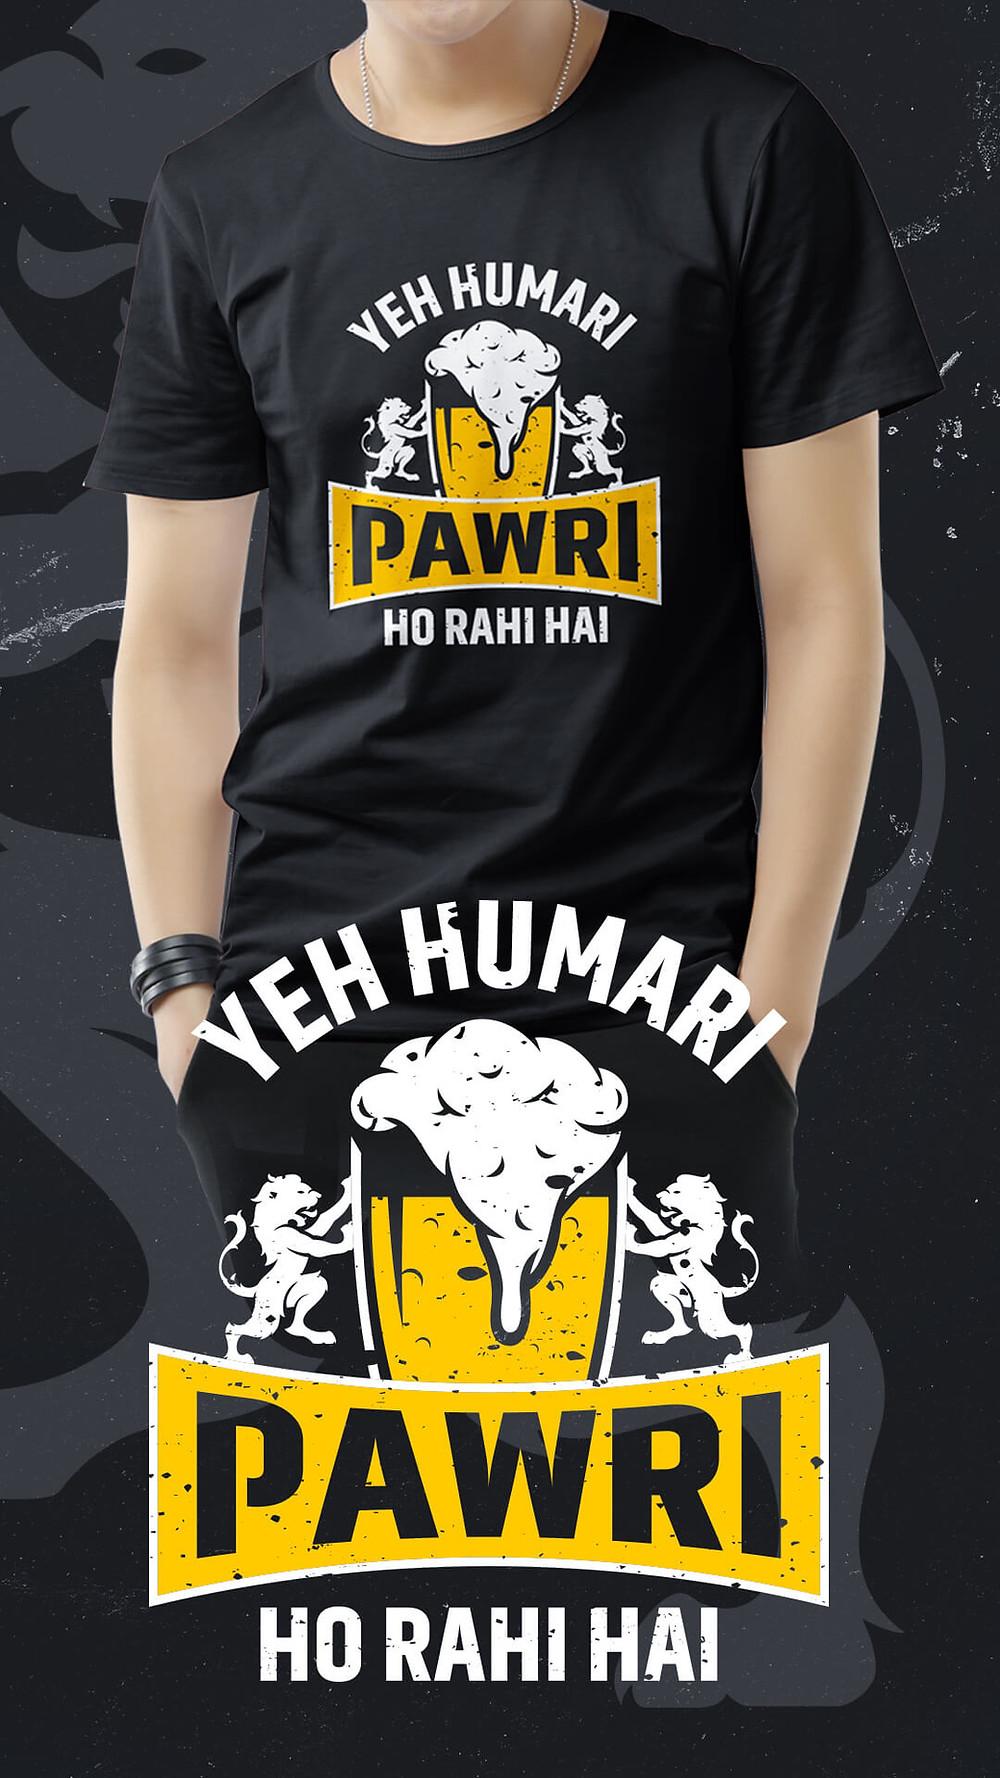 Black T-shirt with Pawri ho rahi hai Print on the chest , Pawri ho rahi hai T-shirt in Mumbai Mulund, Pawri ho rahi hai t-shirt online India Mumbai, #PawriHoRahiHaiTshirt